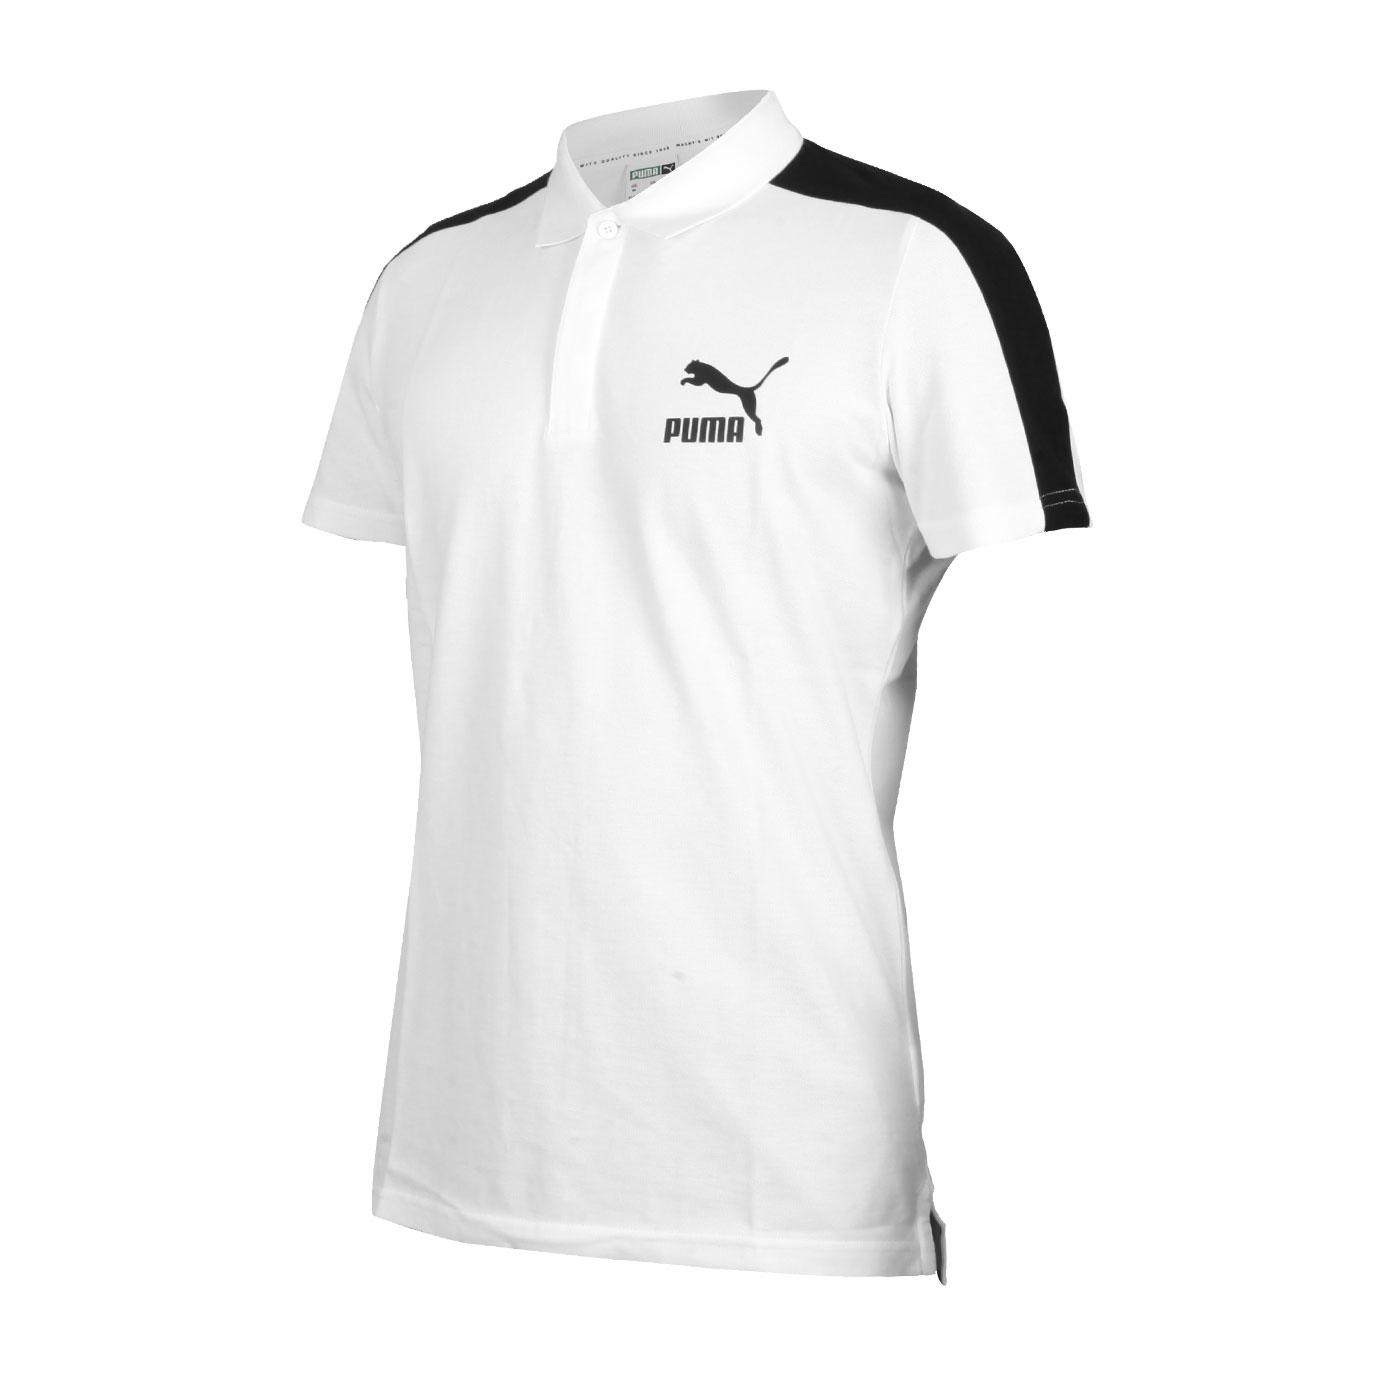 PUMA 男款短袖POLO衫 59644901 - 白黑